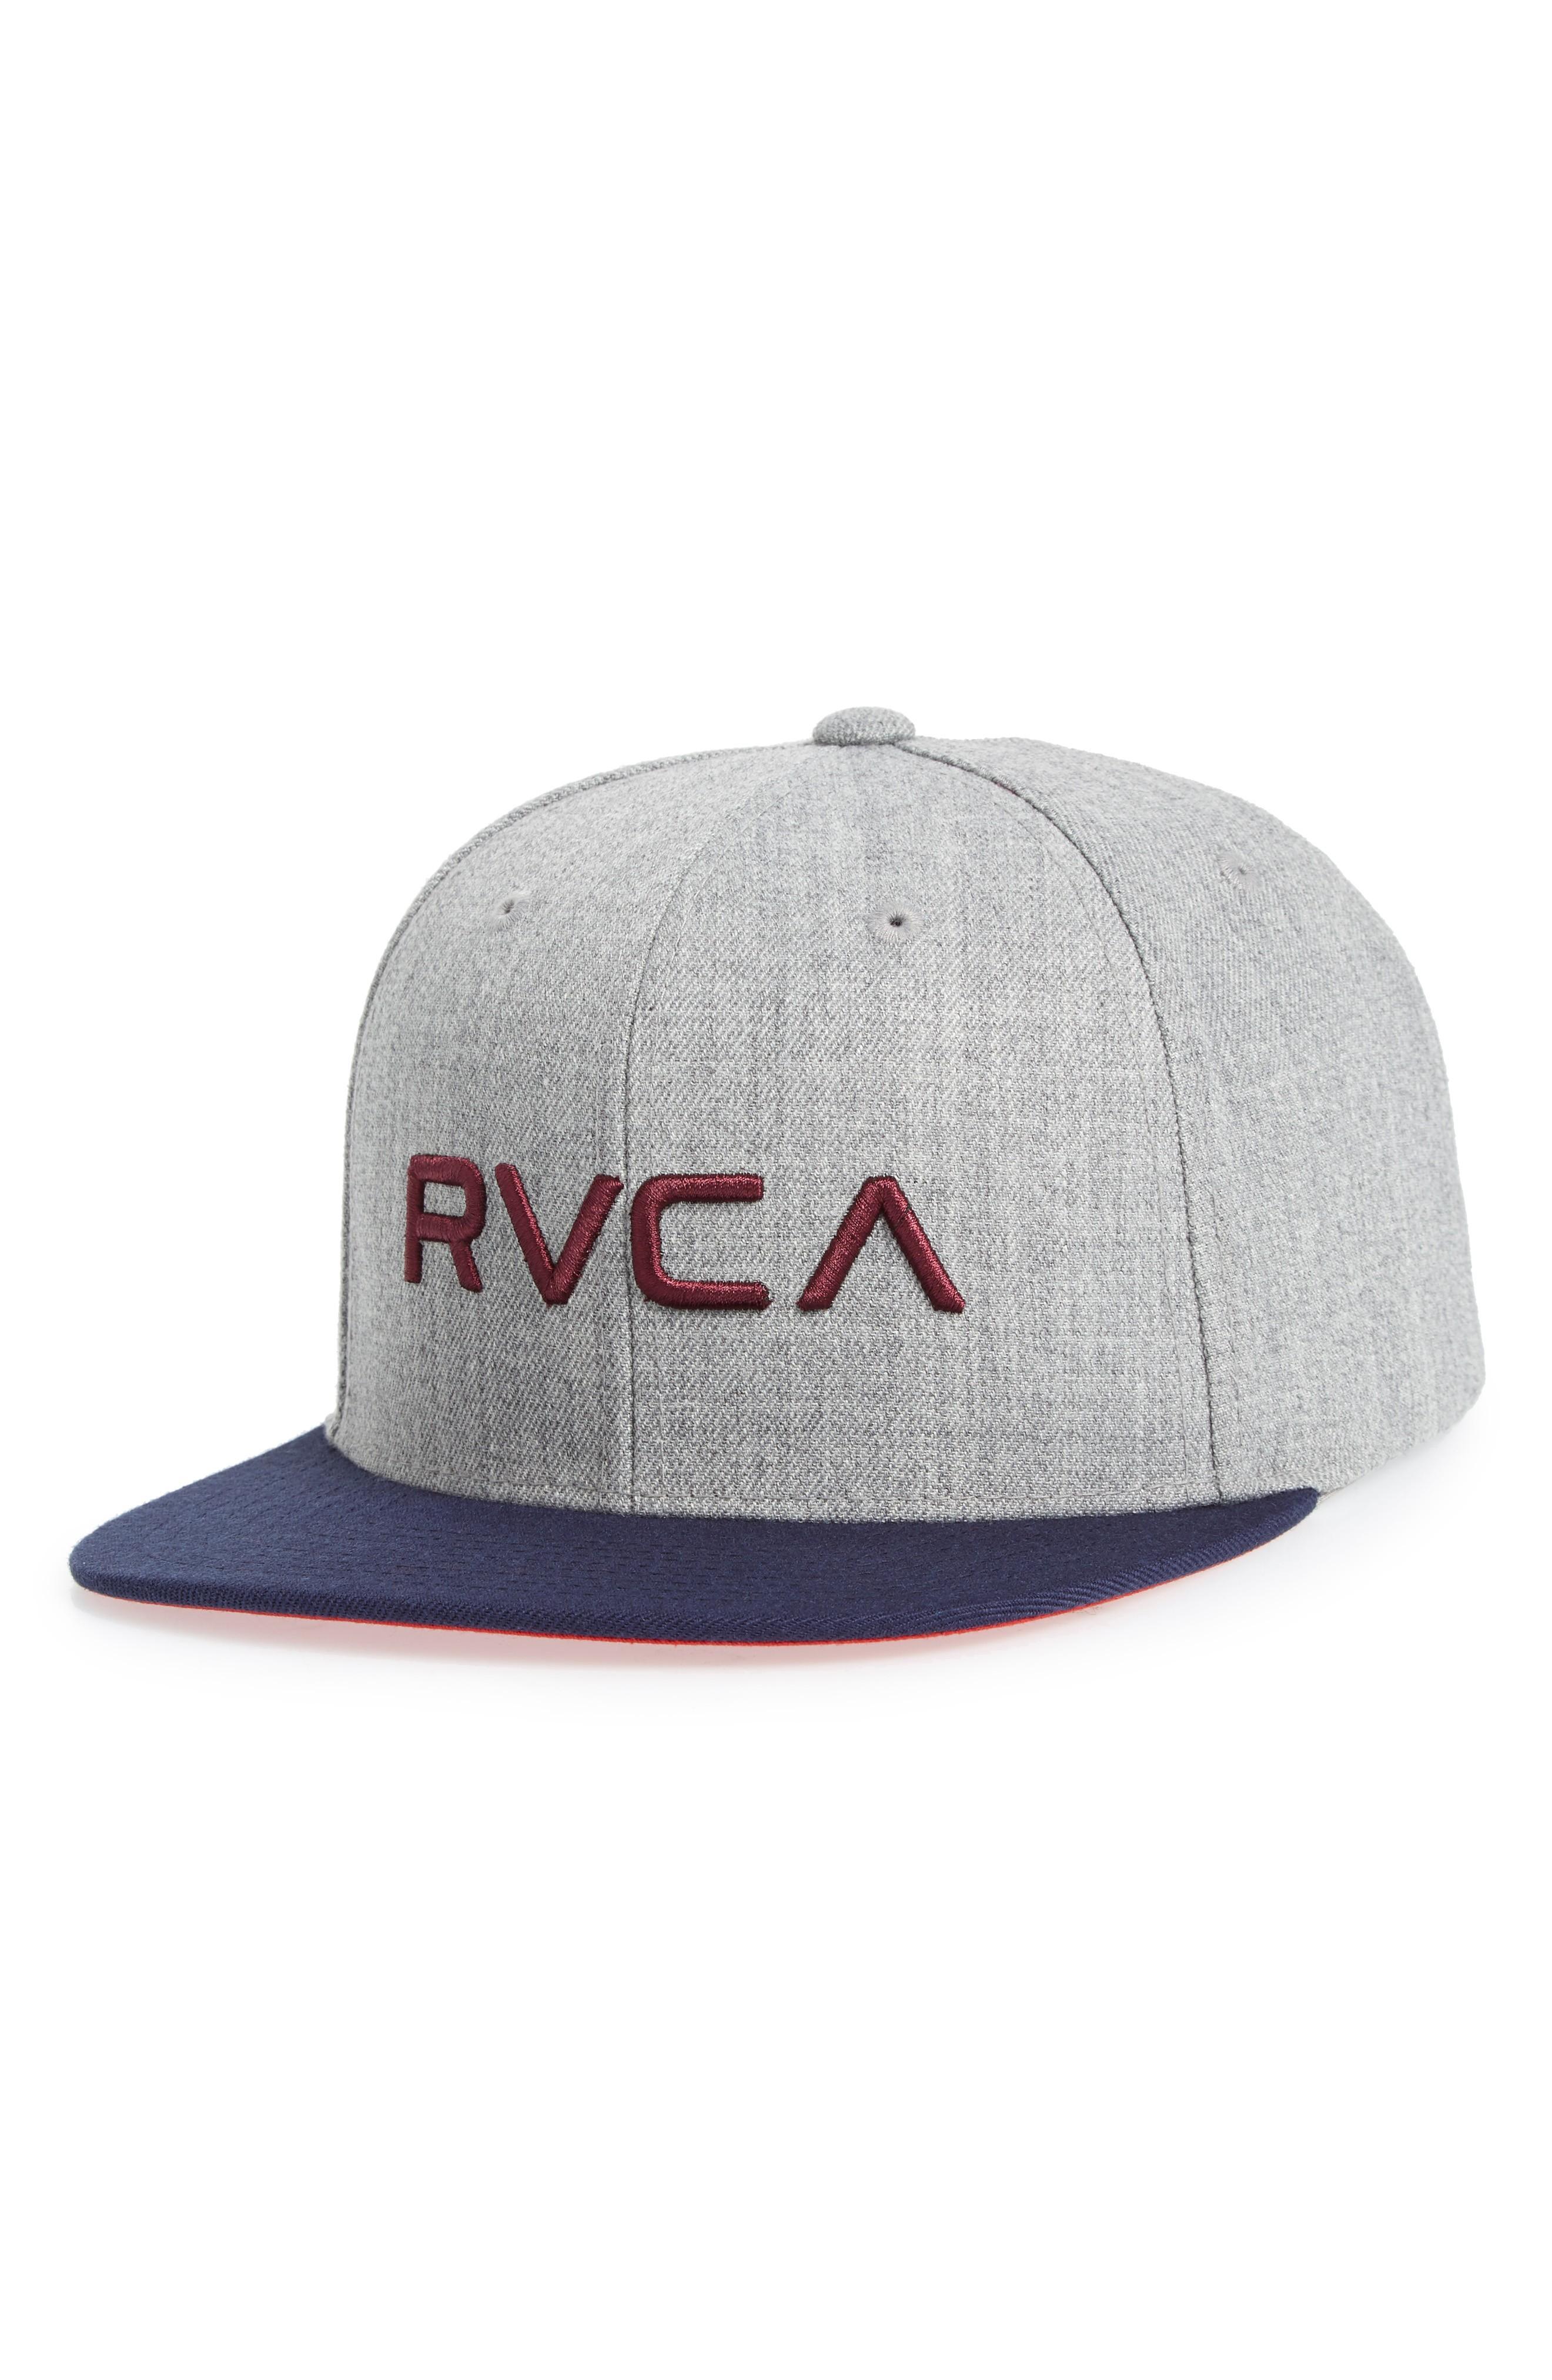 new style 3c111 38cb0 Rvca Twill Snapback Baseball Cap - Grey In Heather Grey Blue